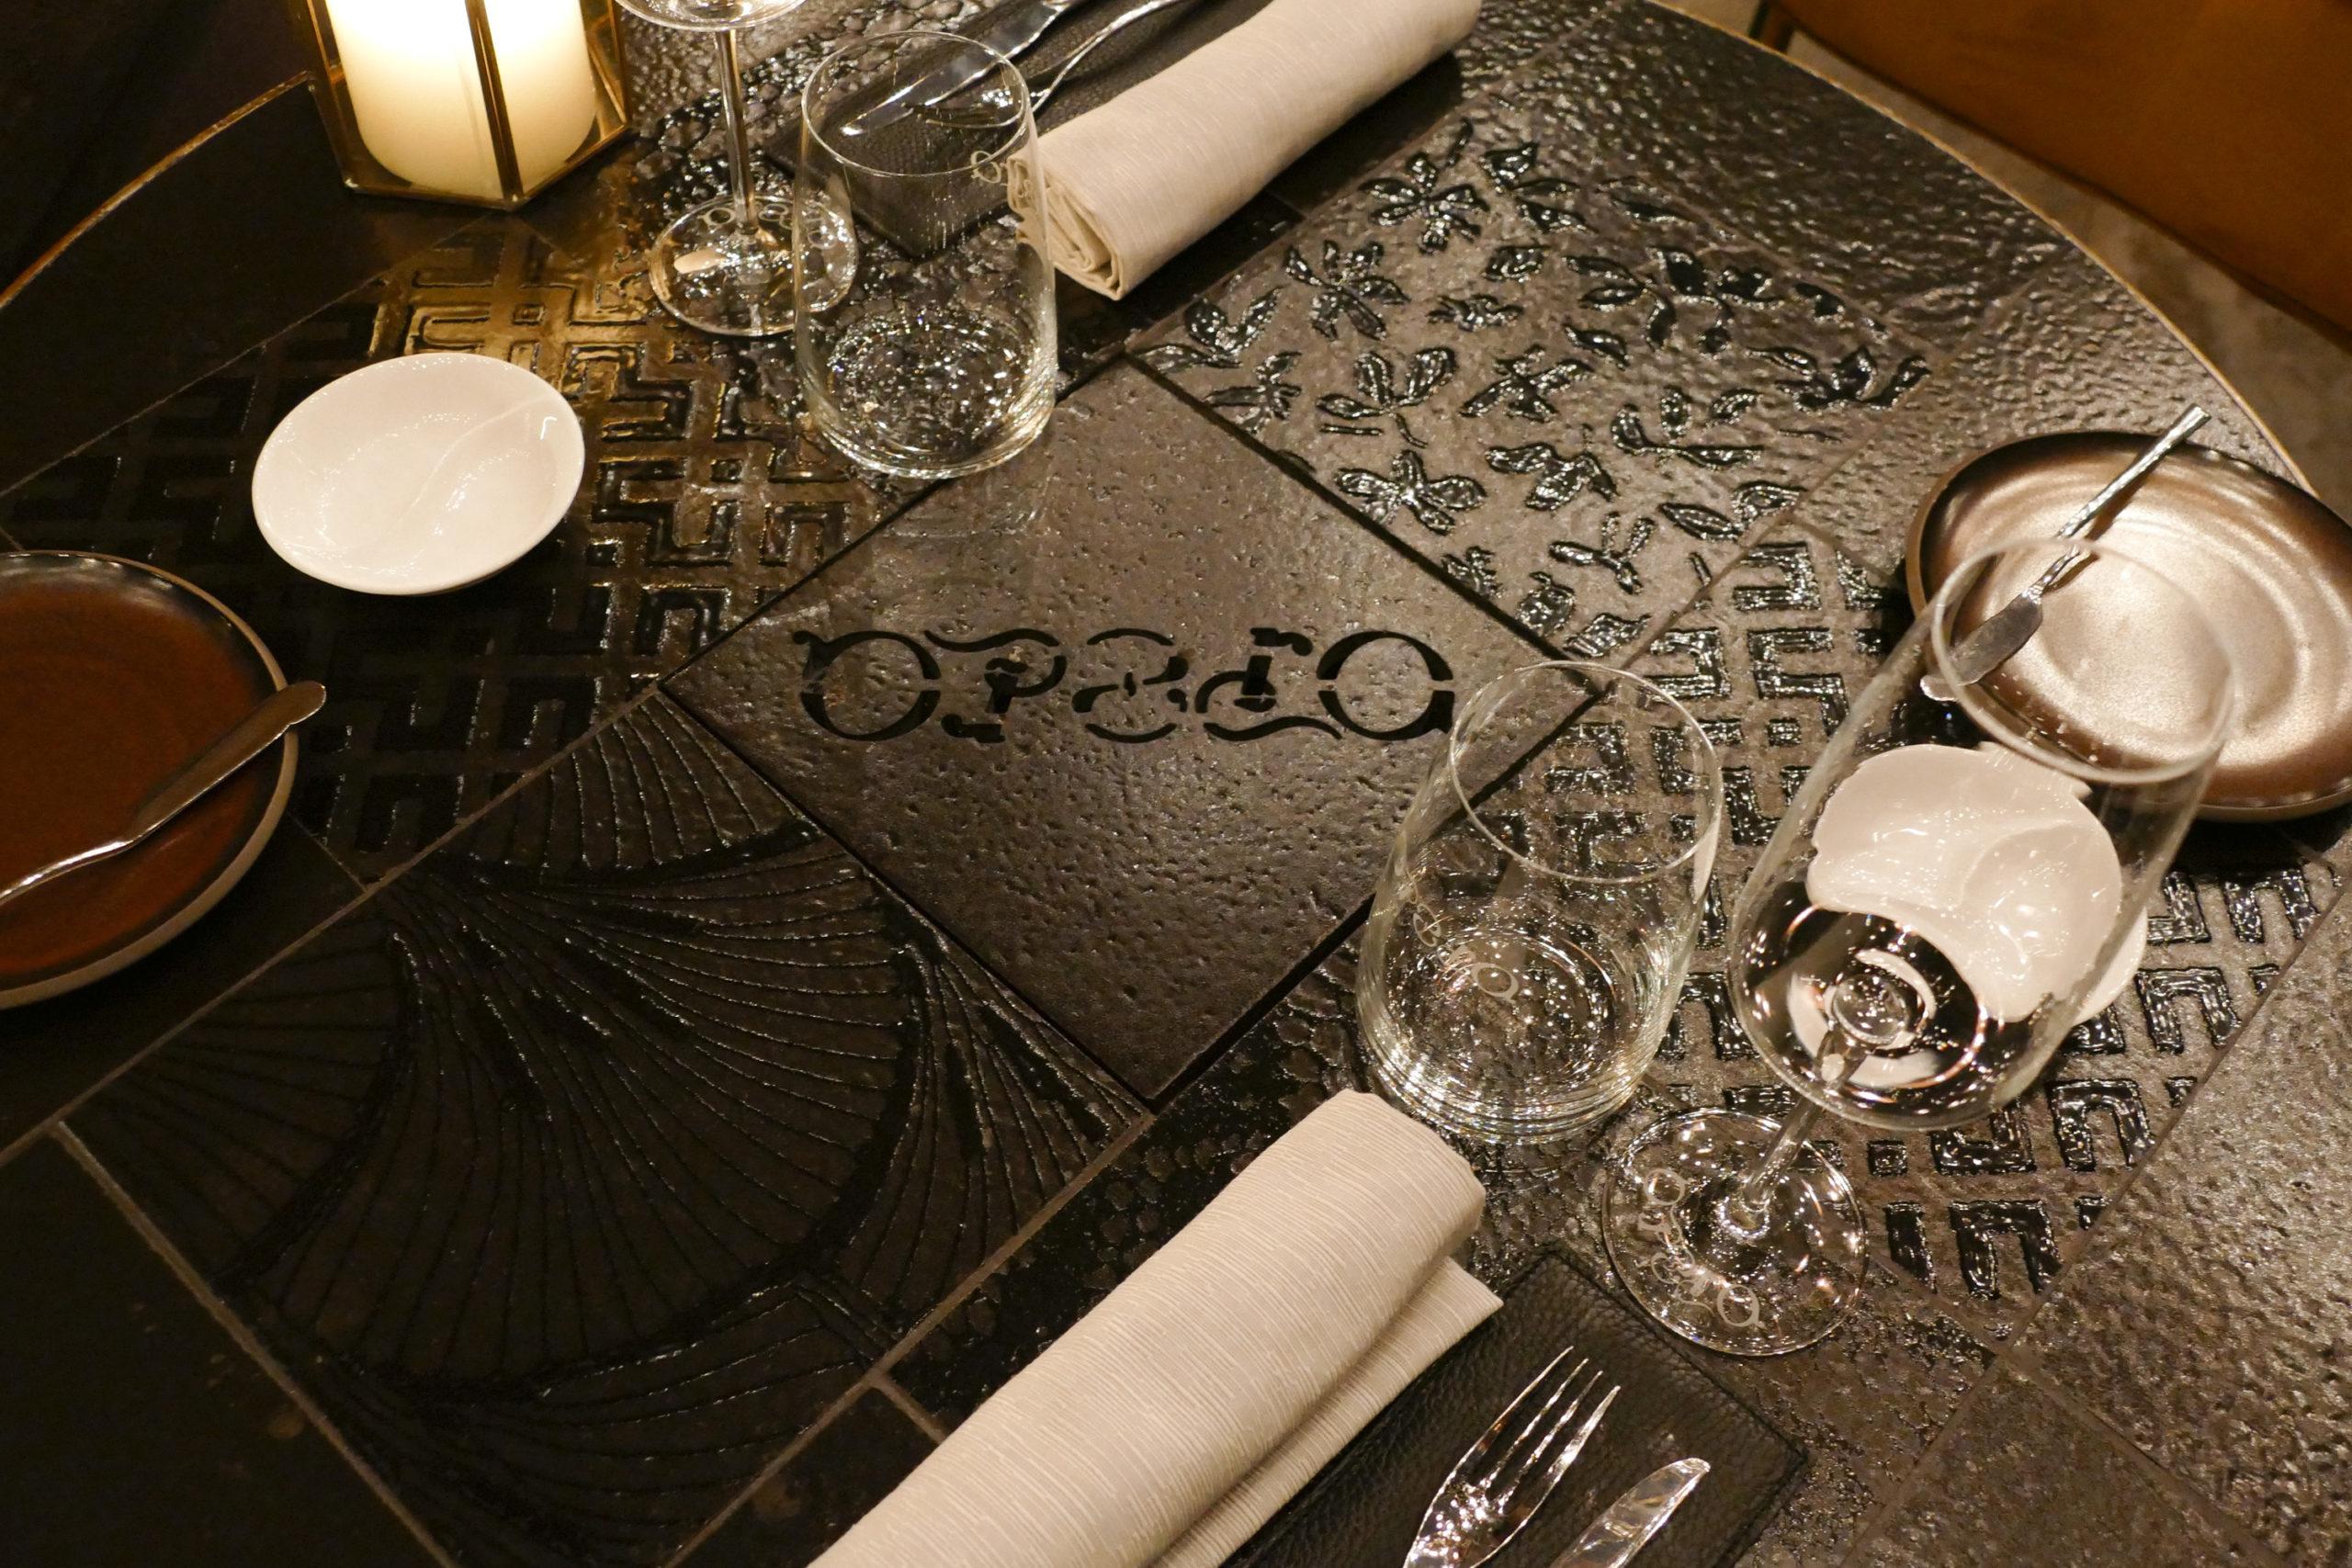 Napoli a tavola e atmosfere newyorkesi da Opera Restaurant 4